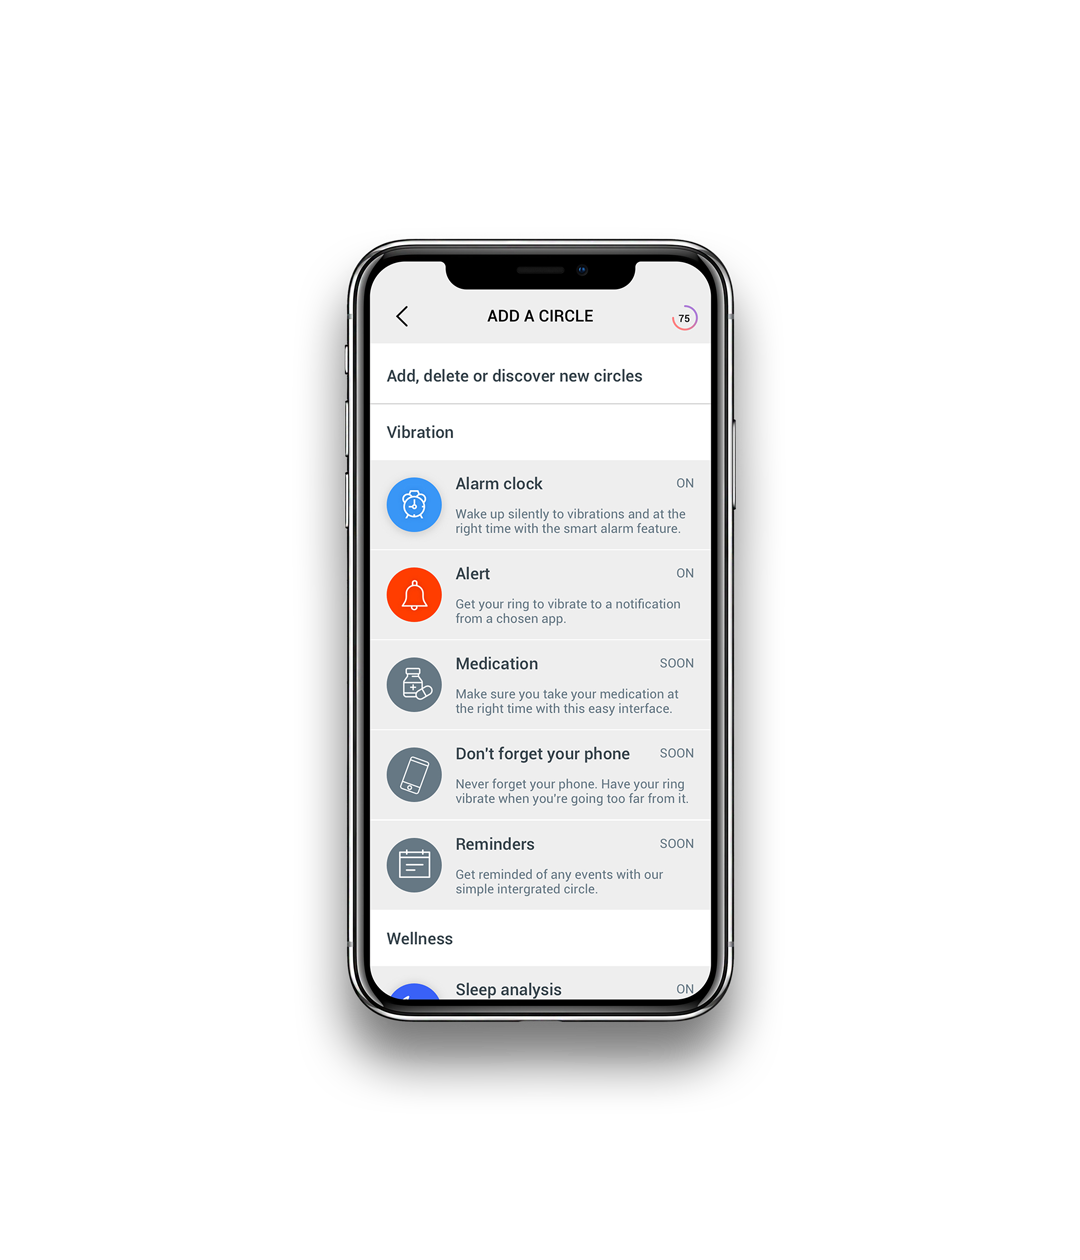 Circular App Add A Circle